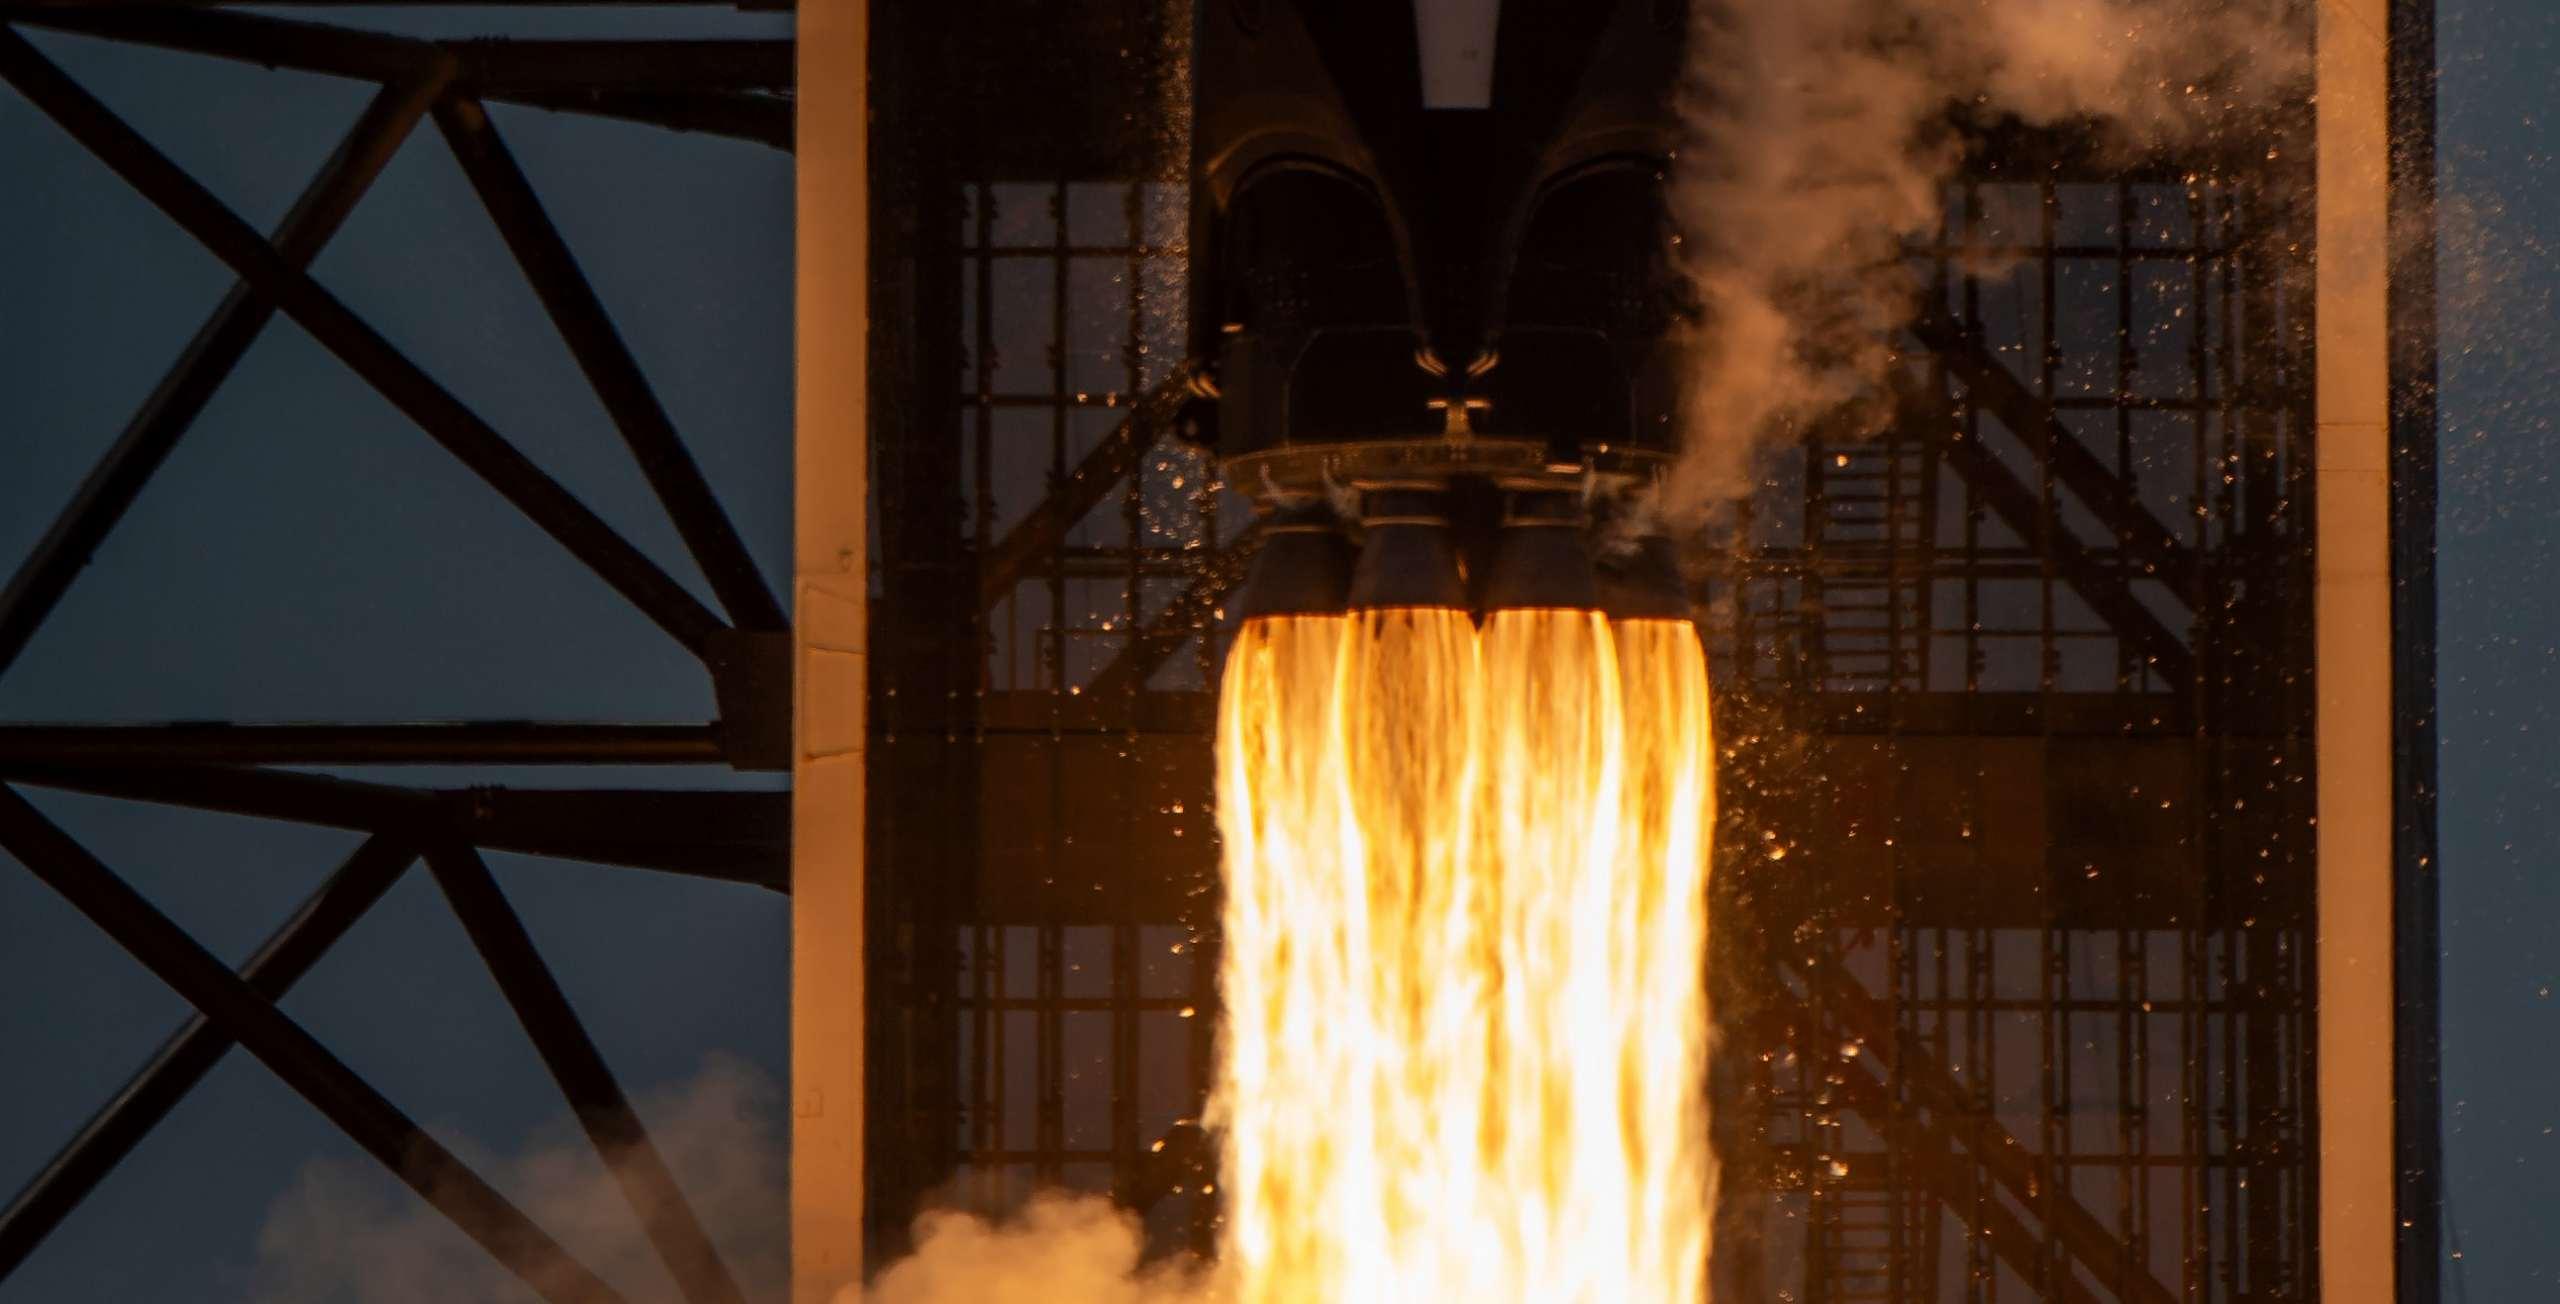 Crew Dragon C206 F9 B1058 Demo-2 39A 053020 (NASA) launch 8 crop (c)